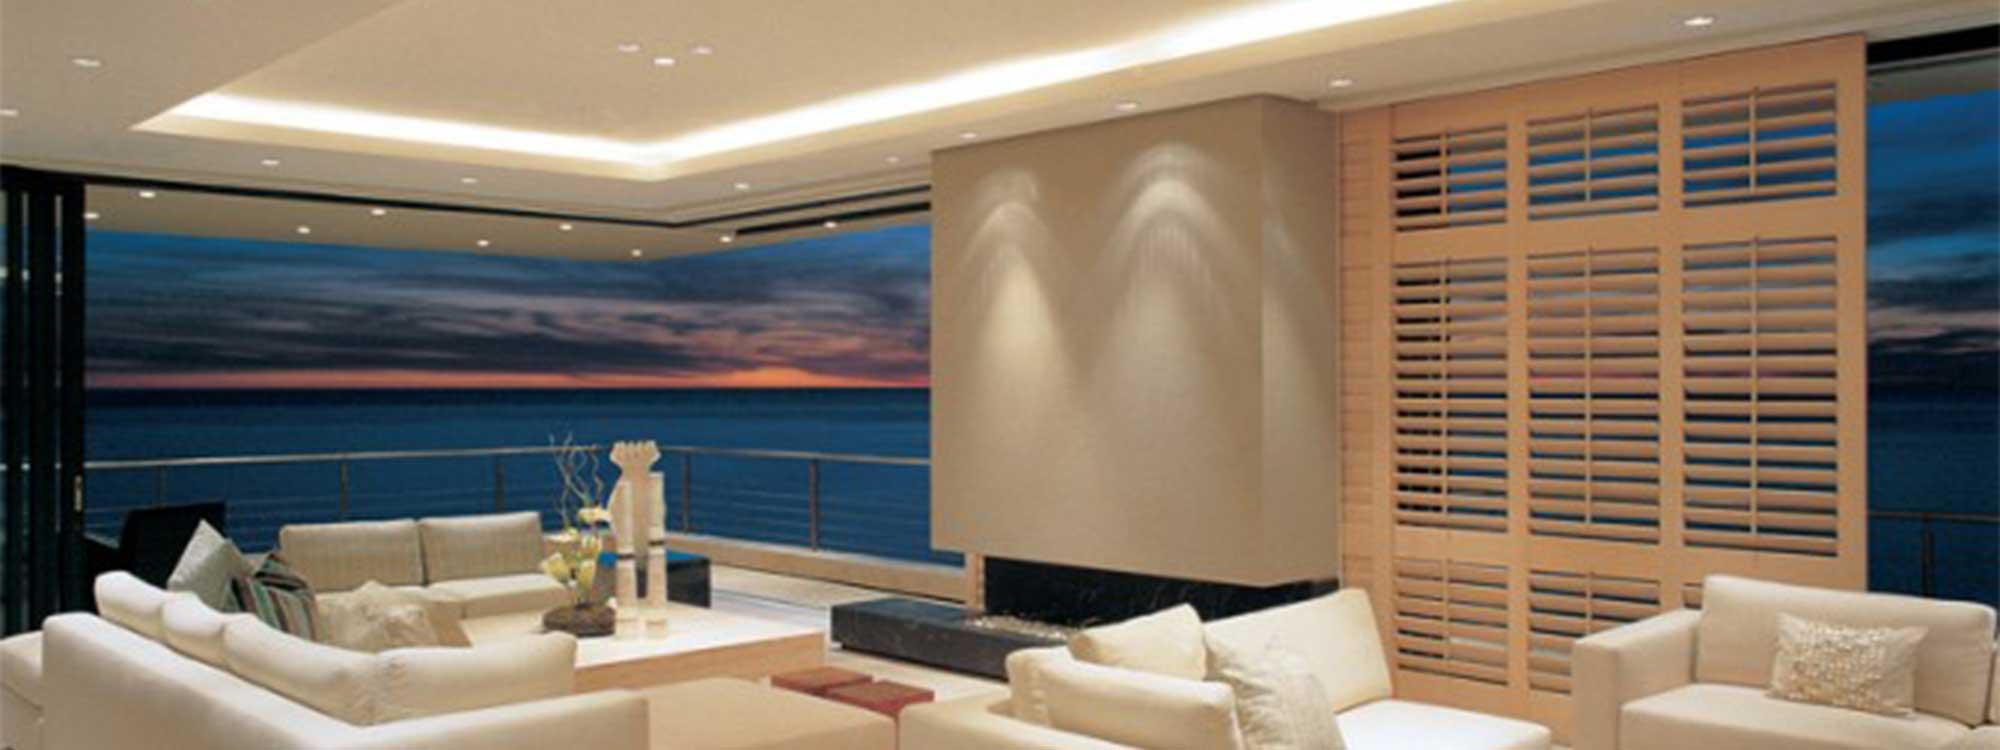 White-Teak-shutters-living-area-open-view